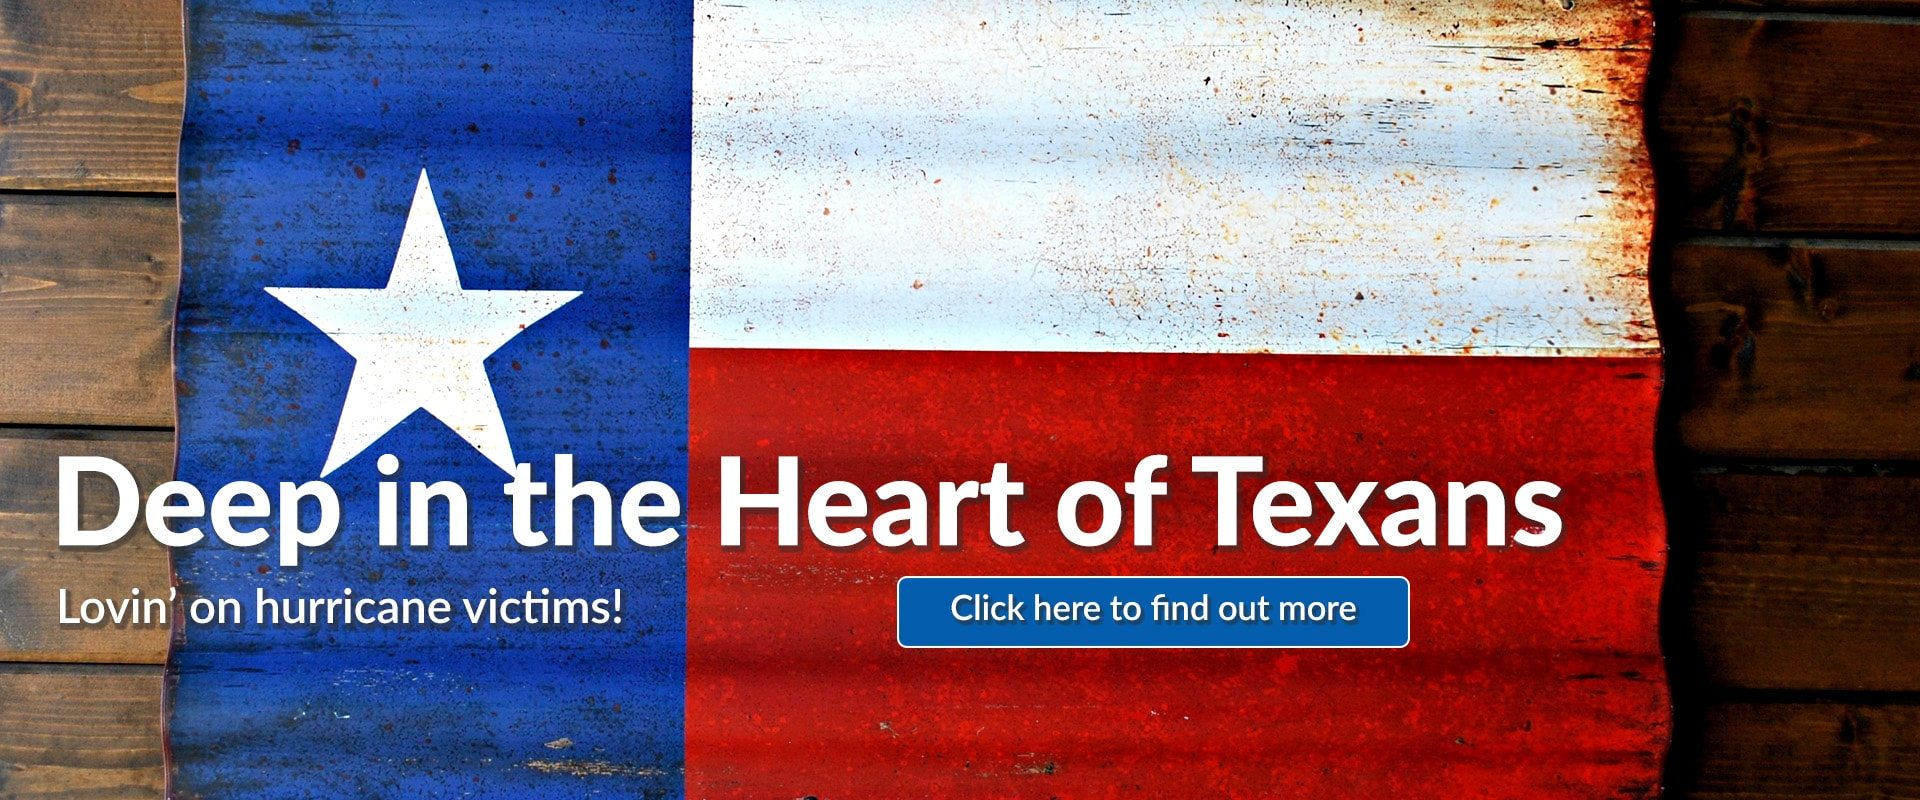 91.3 KGLY East Texas Christian Radio Deep in the Heart of Texans Lovin' on Hurricane Harvey Victims